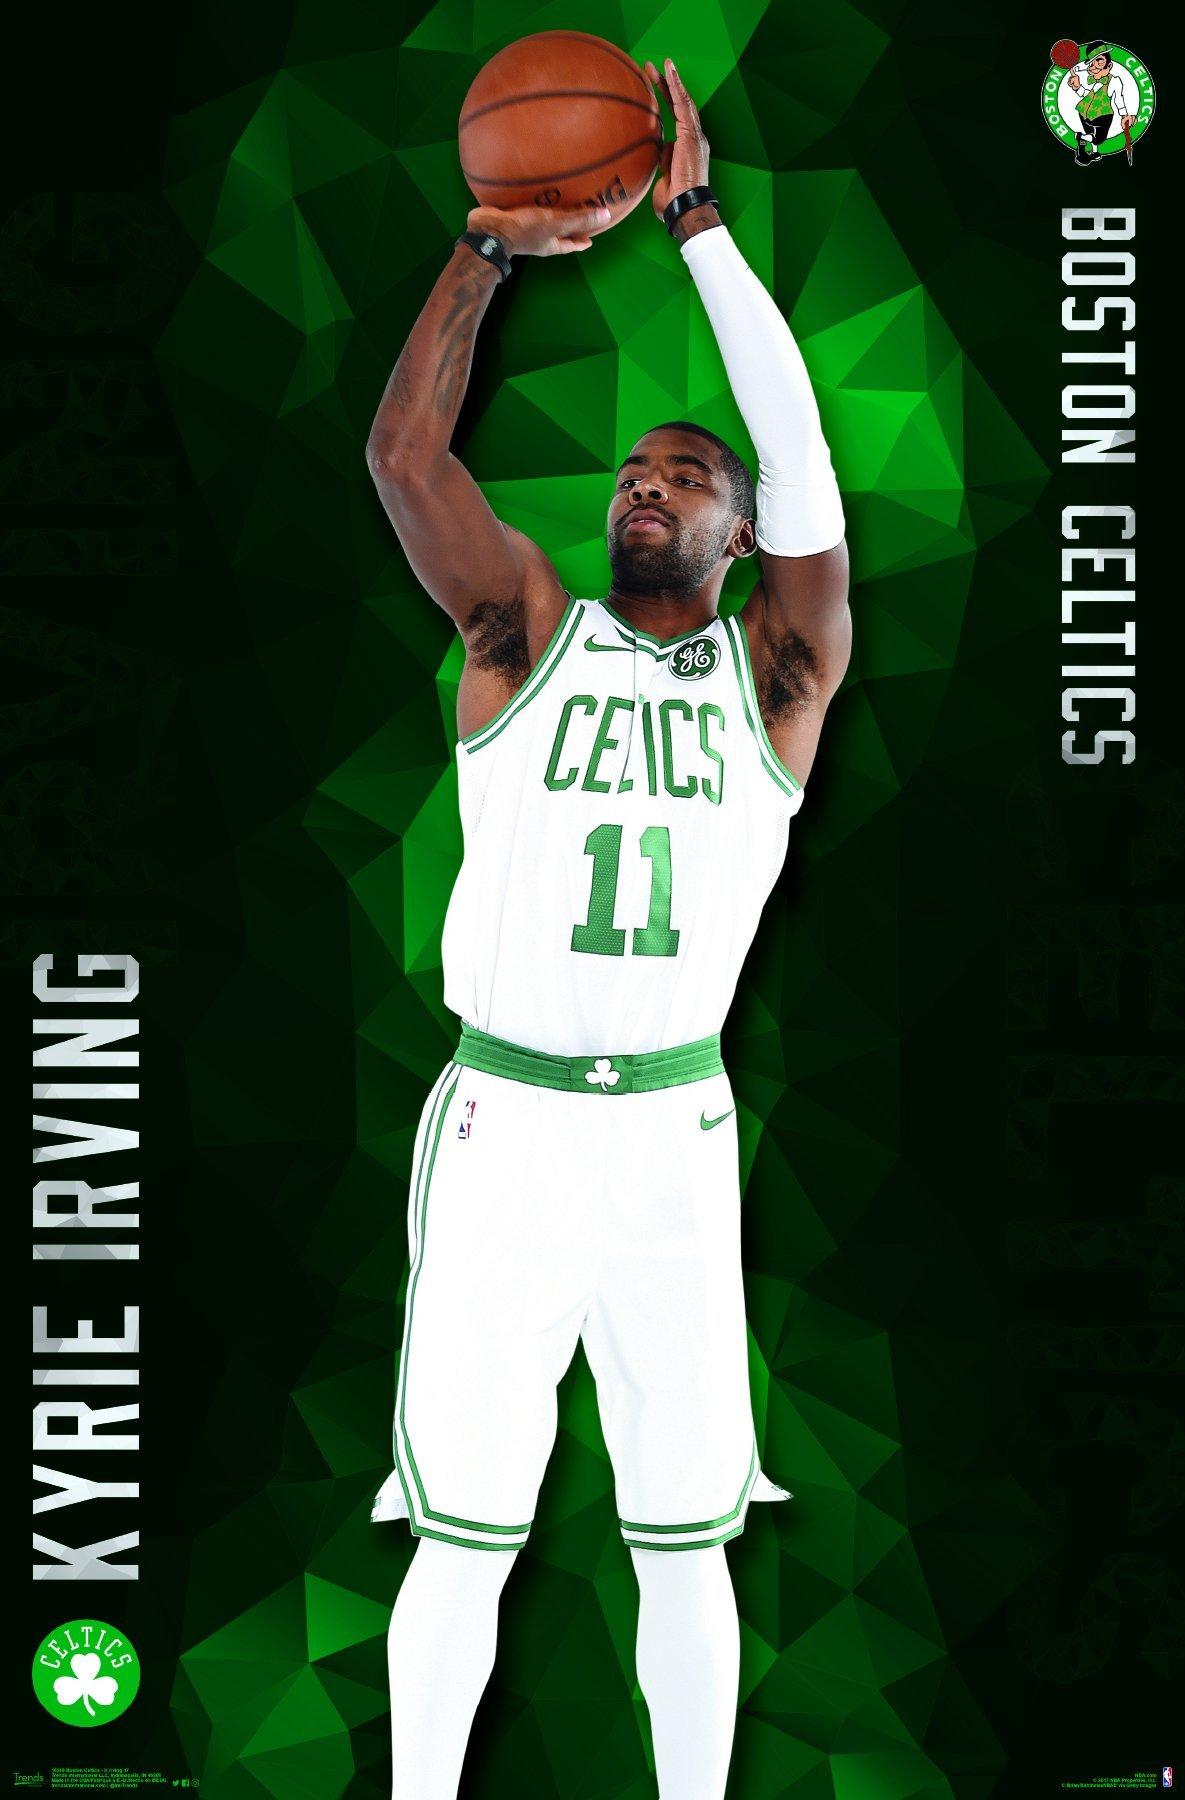 Trends International Boston Celtics-Kyrie Irving Premium Wall Poster, 22.375'' x 34''